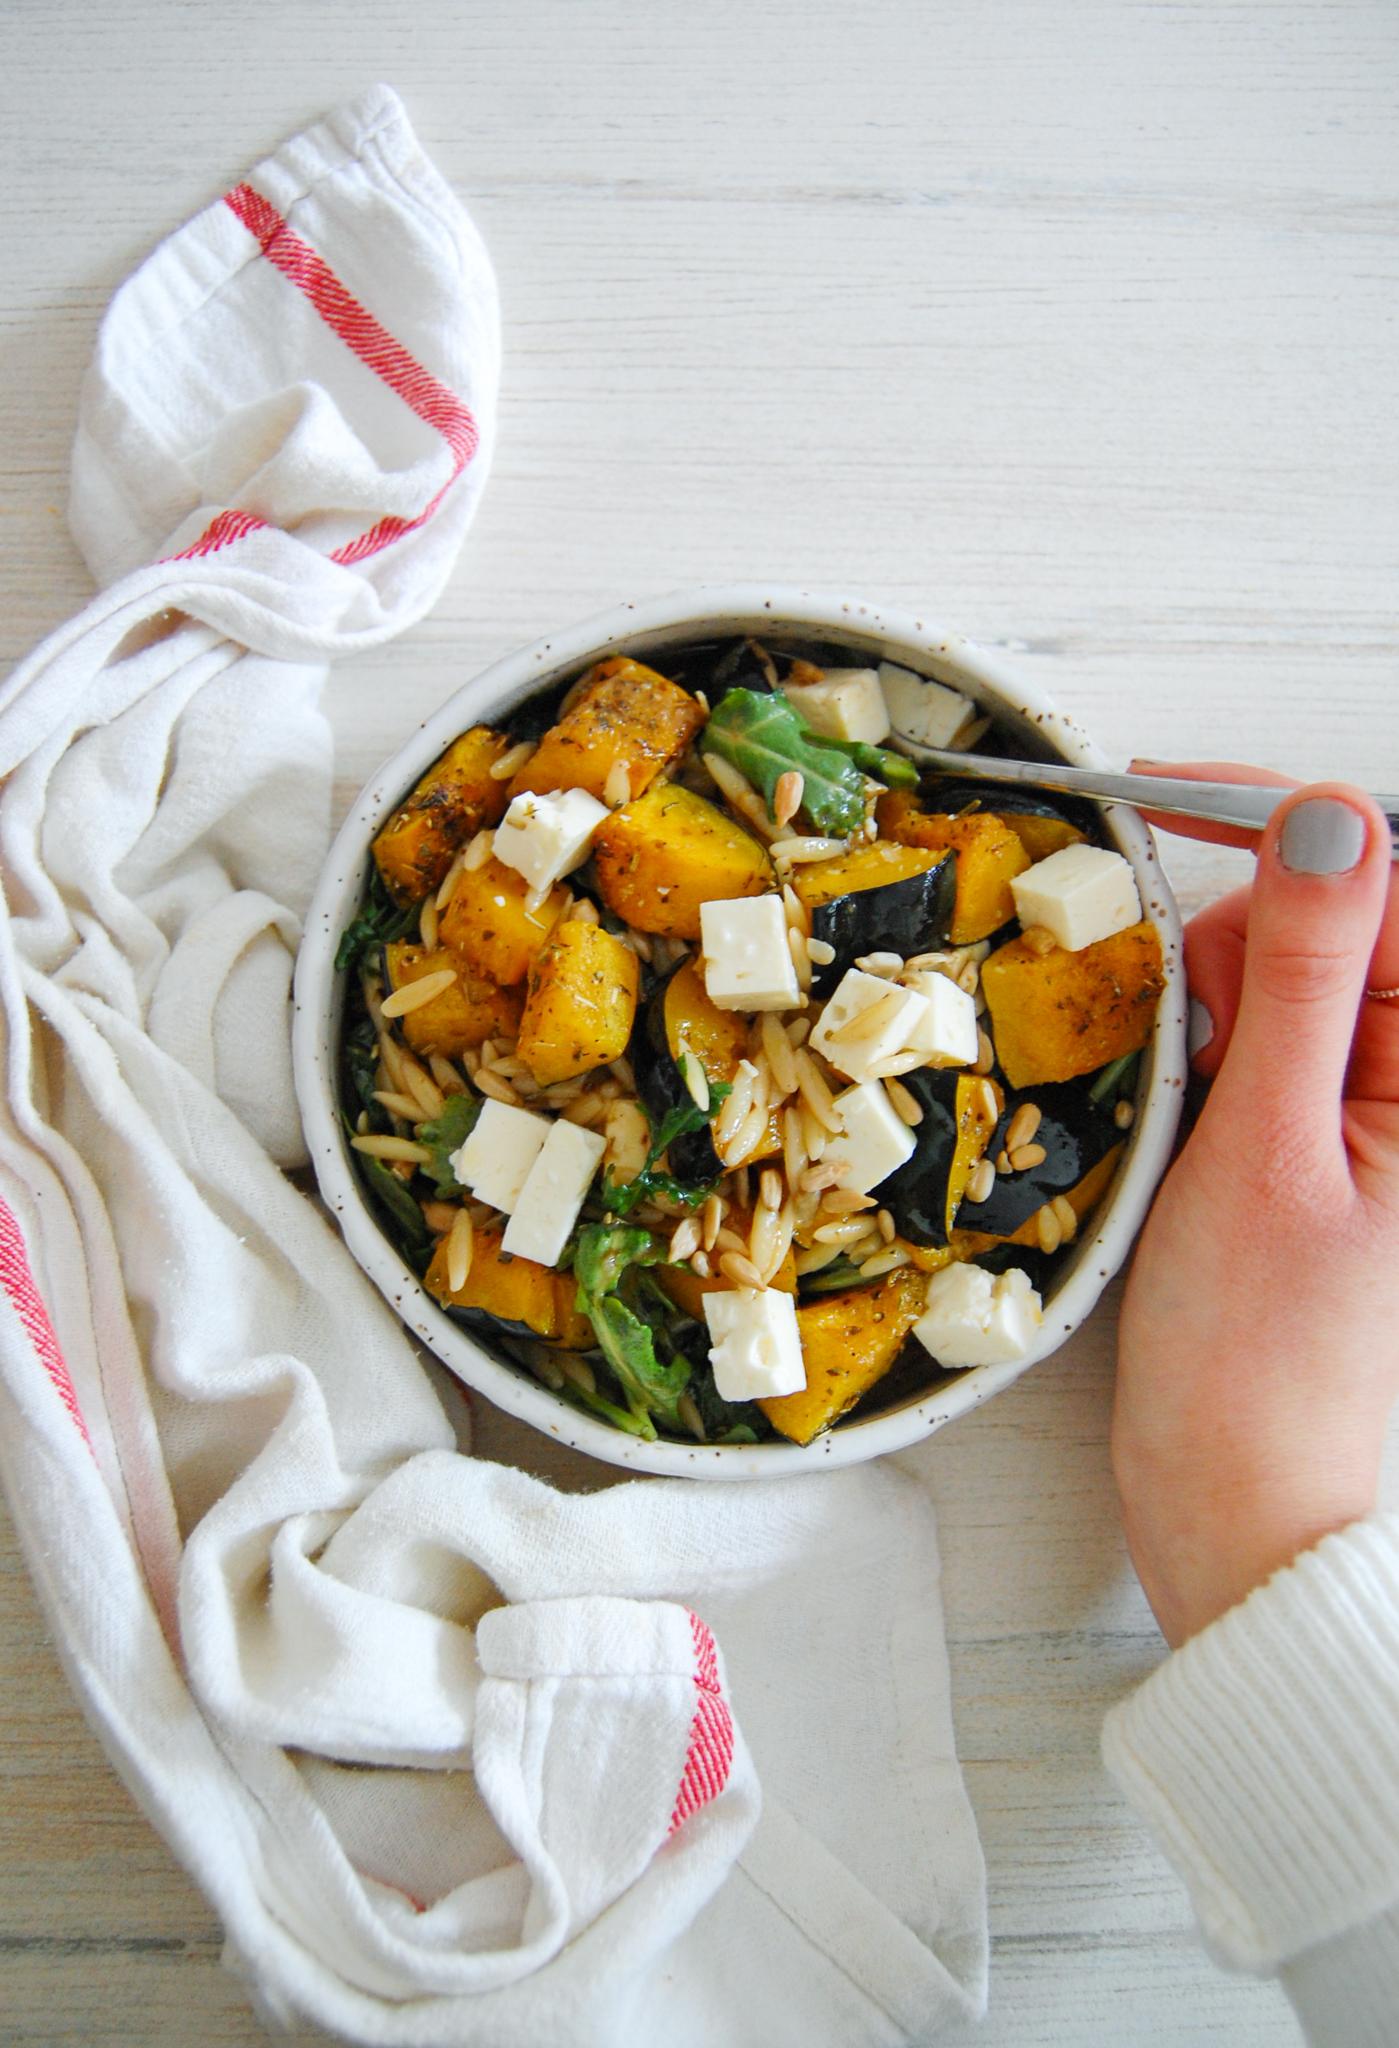 Salade tiède d'orzo & courge rôtie